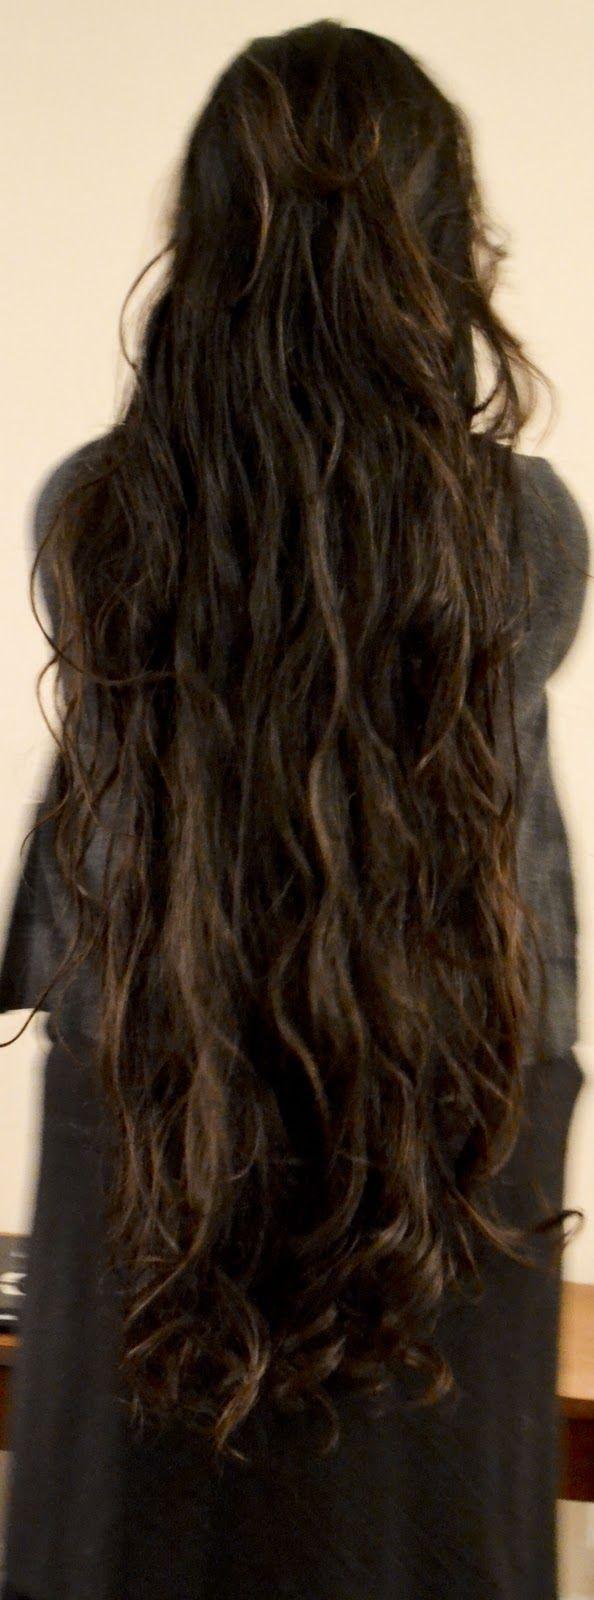 pentecostal hair